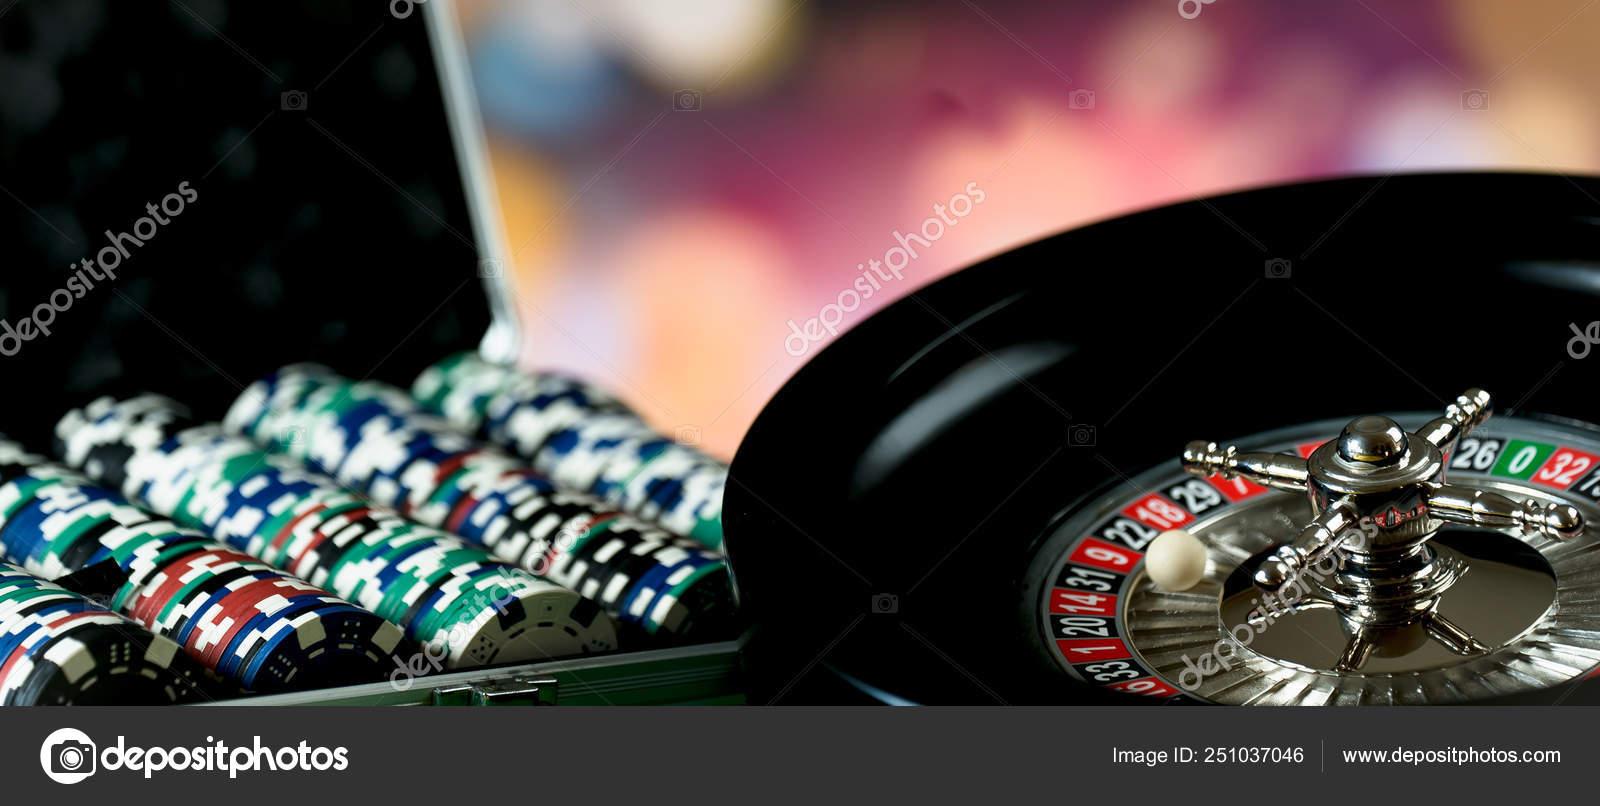 Latar Belakang Kasino Poker Chips Meja Judi Roda Roulette Bergerak — Stok  Foto © AerialMike #251037046